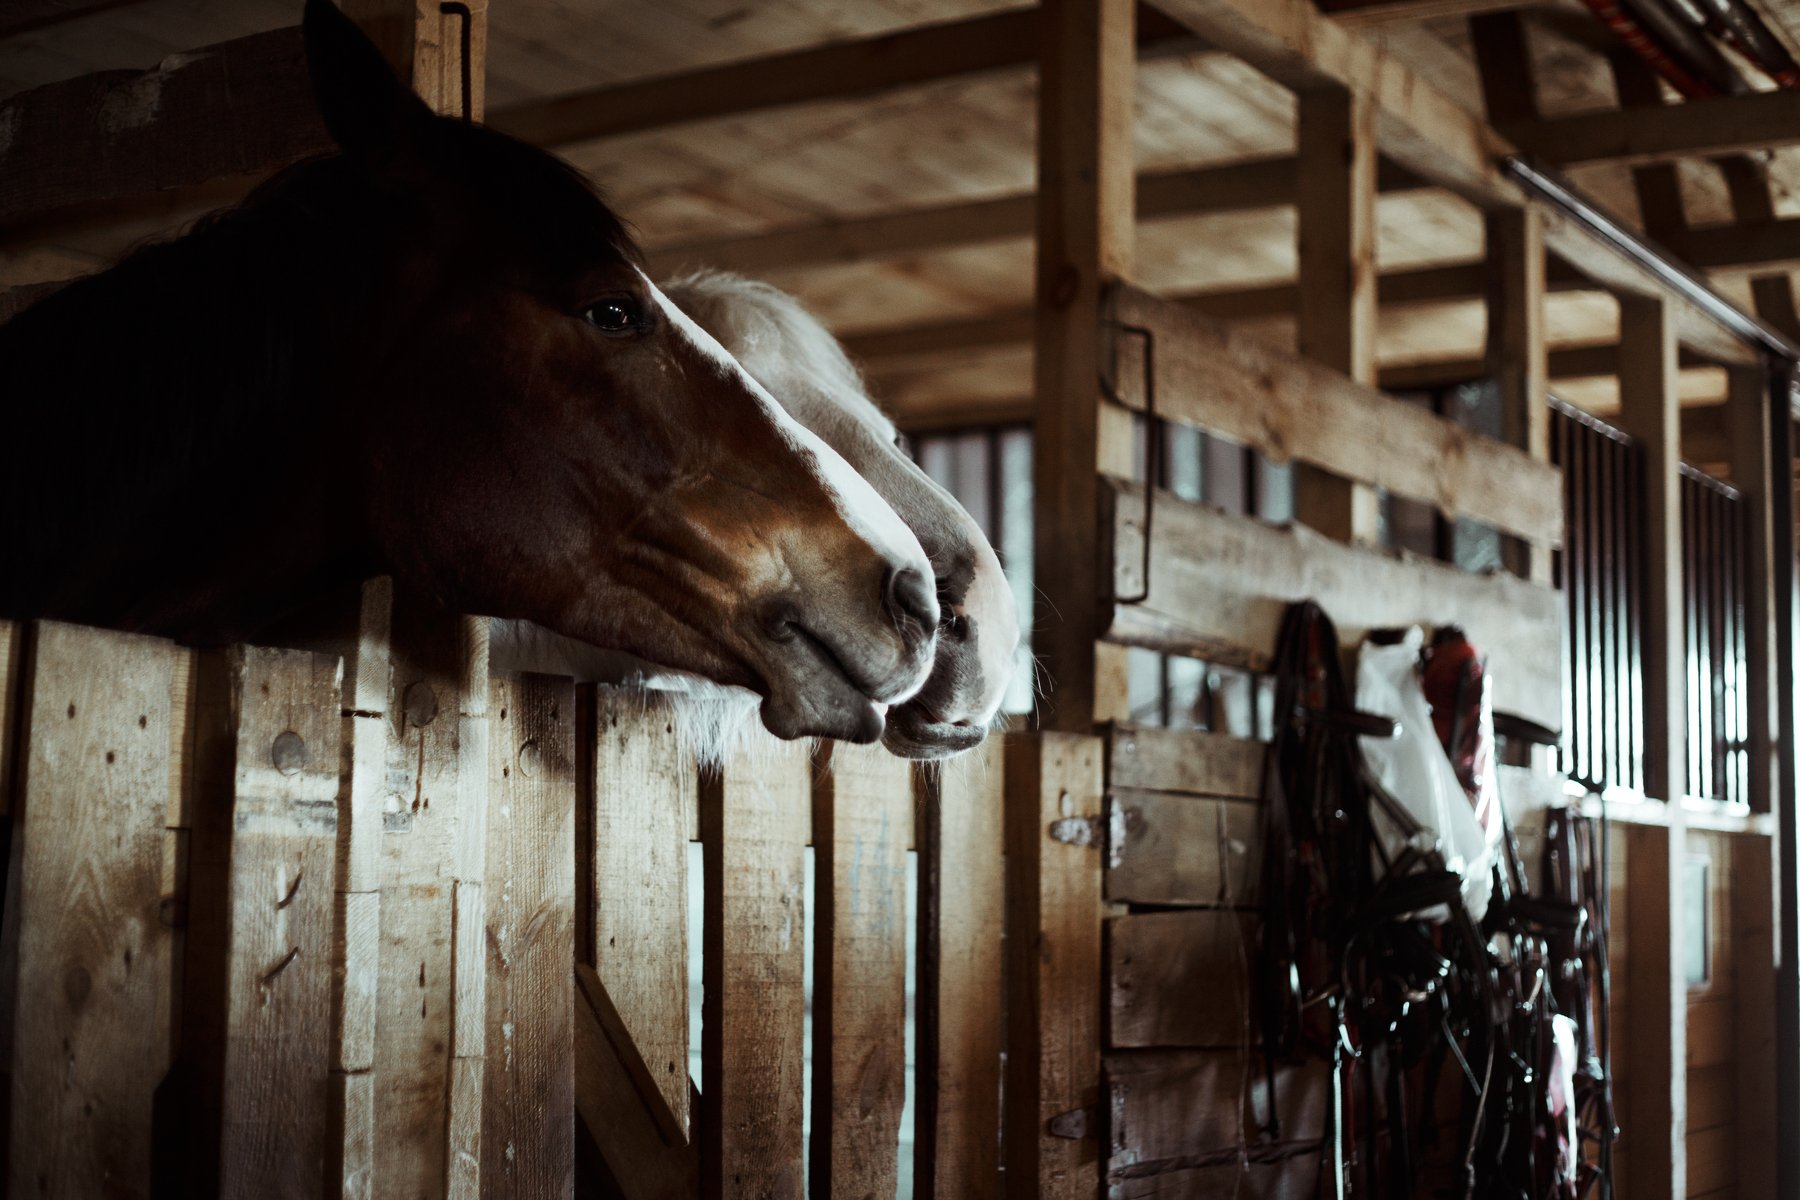 horses, stables for horses, steed, hoss, конь, лошадь, конюшня, , Маховицкая Кристина